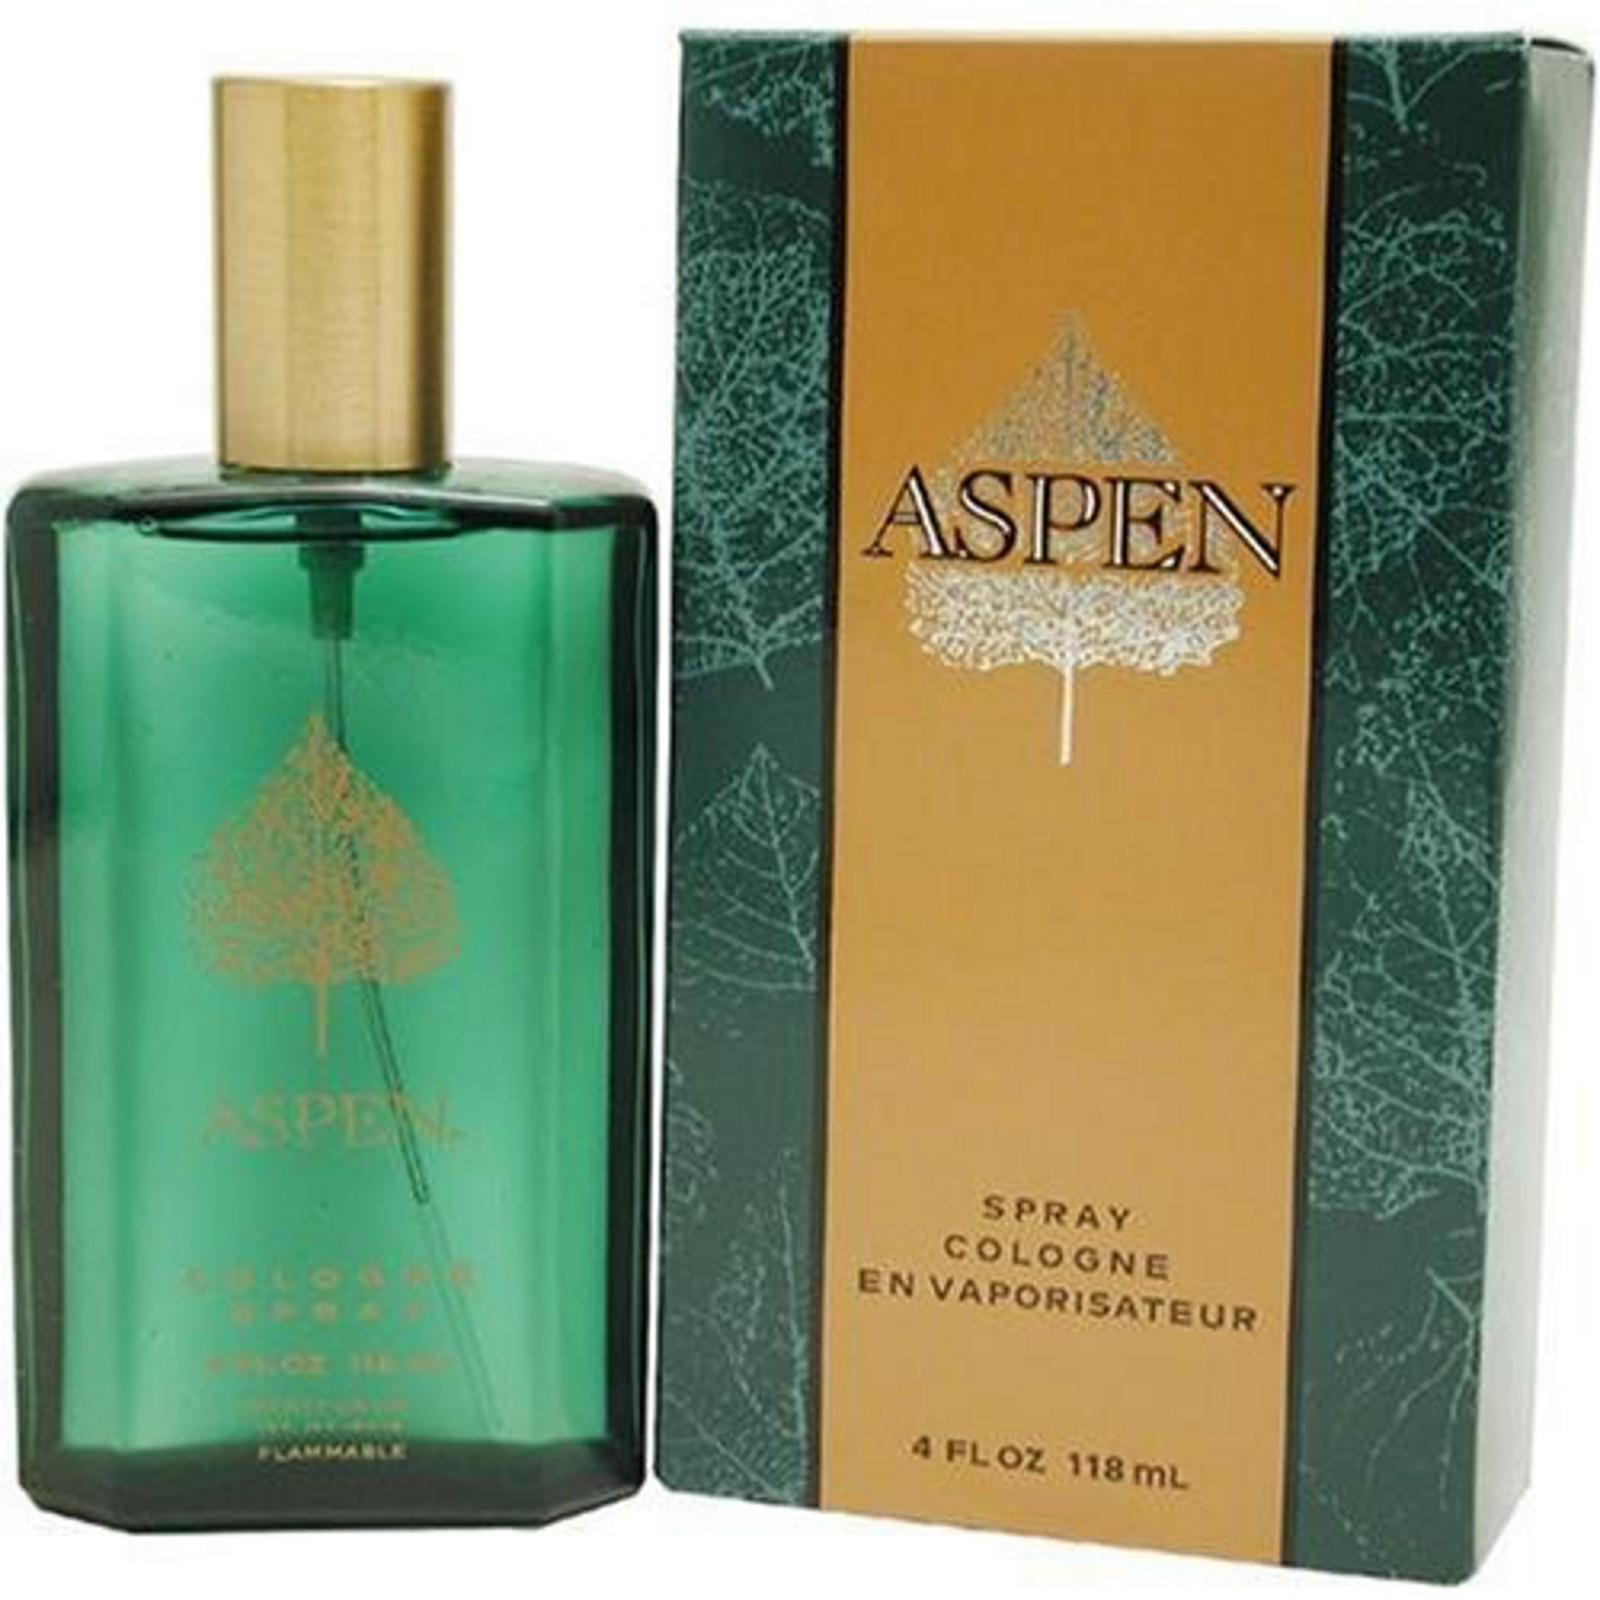 Coty Aspen for Men аромат для мужчин